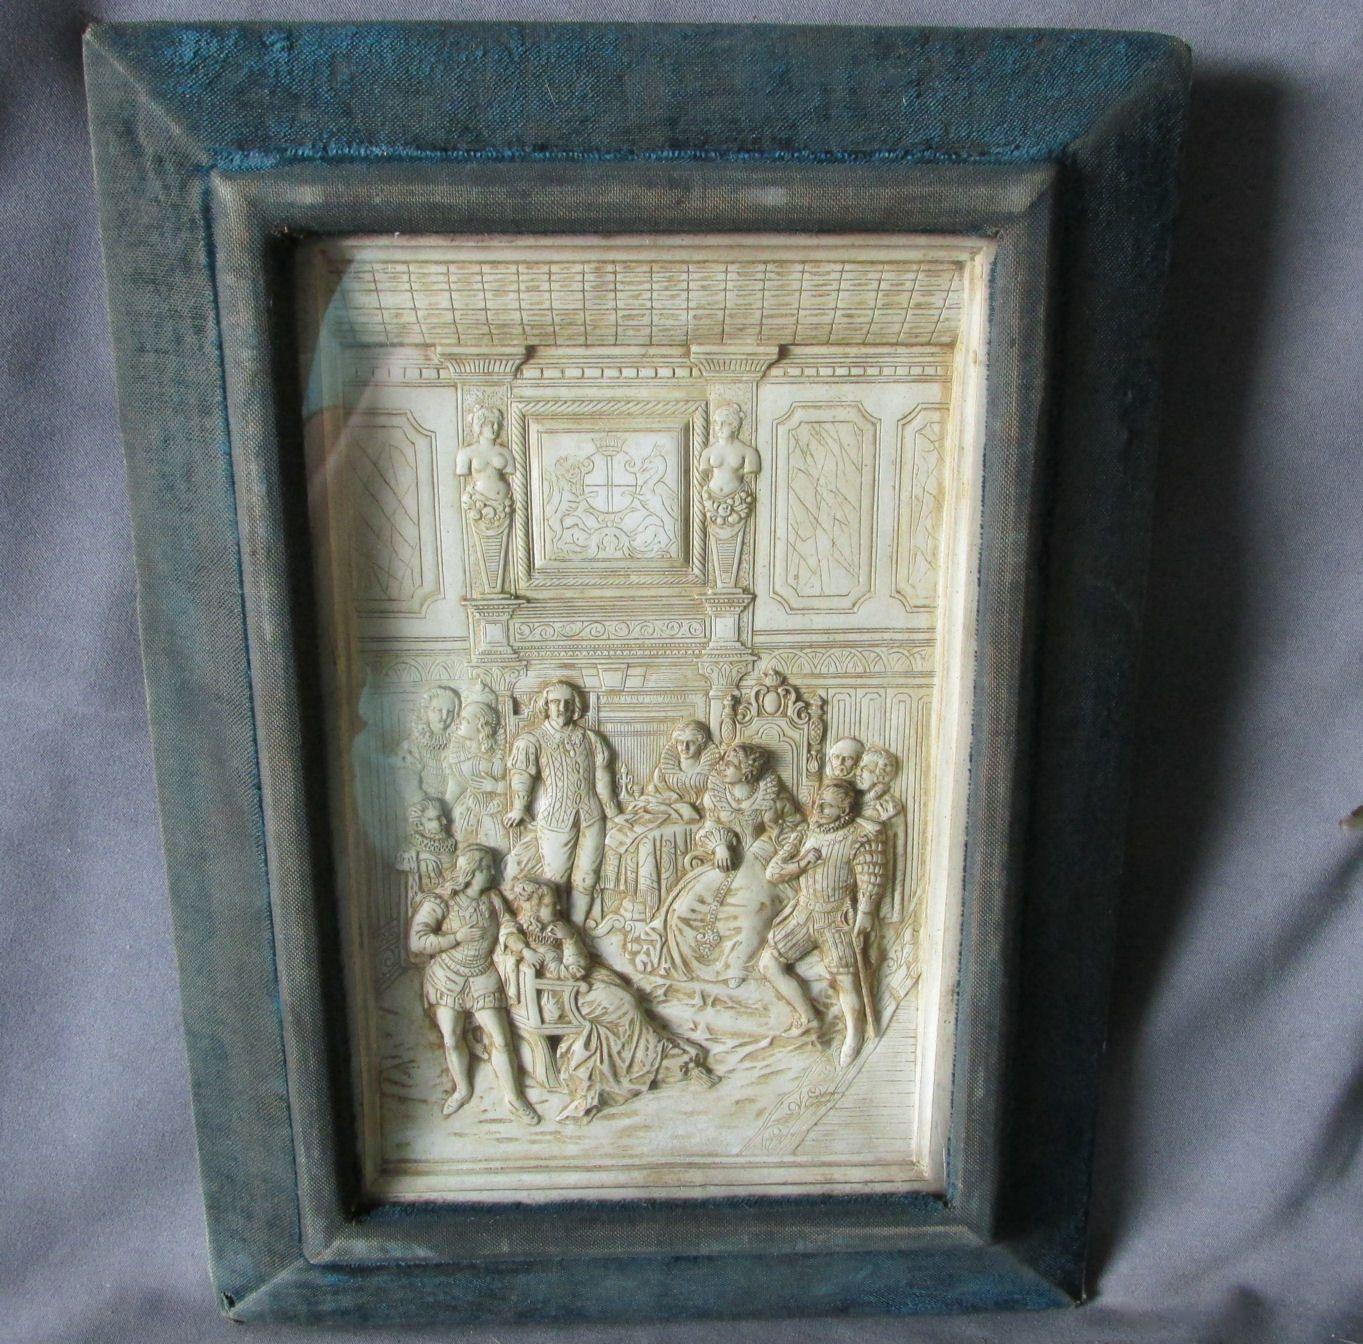 Lovely 19thC Shadowbox Frame with Elizabethan, Shakespeare Scene